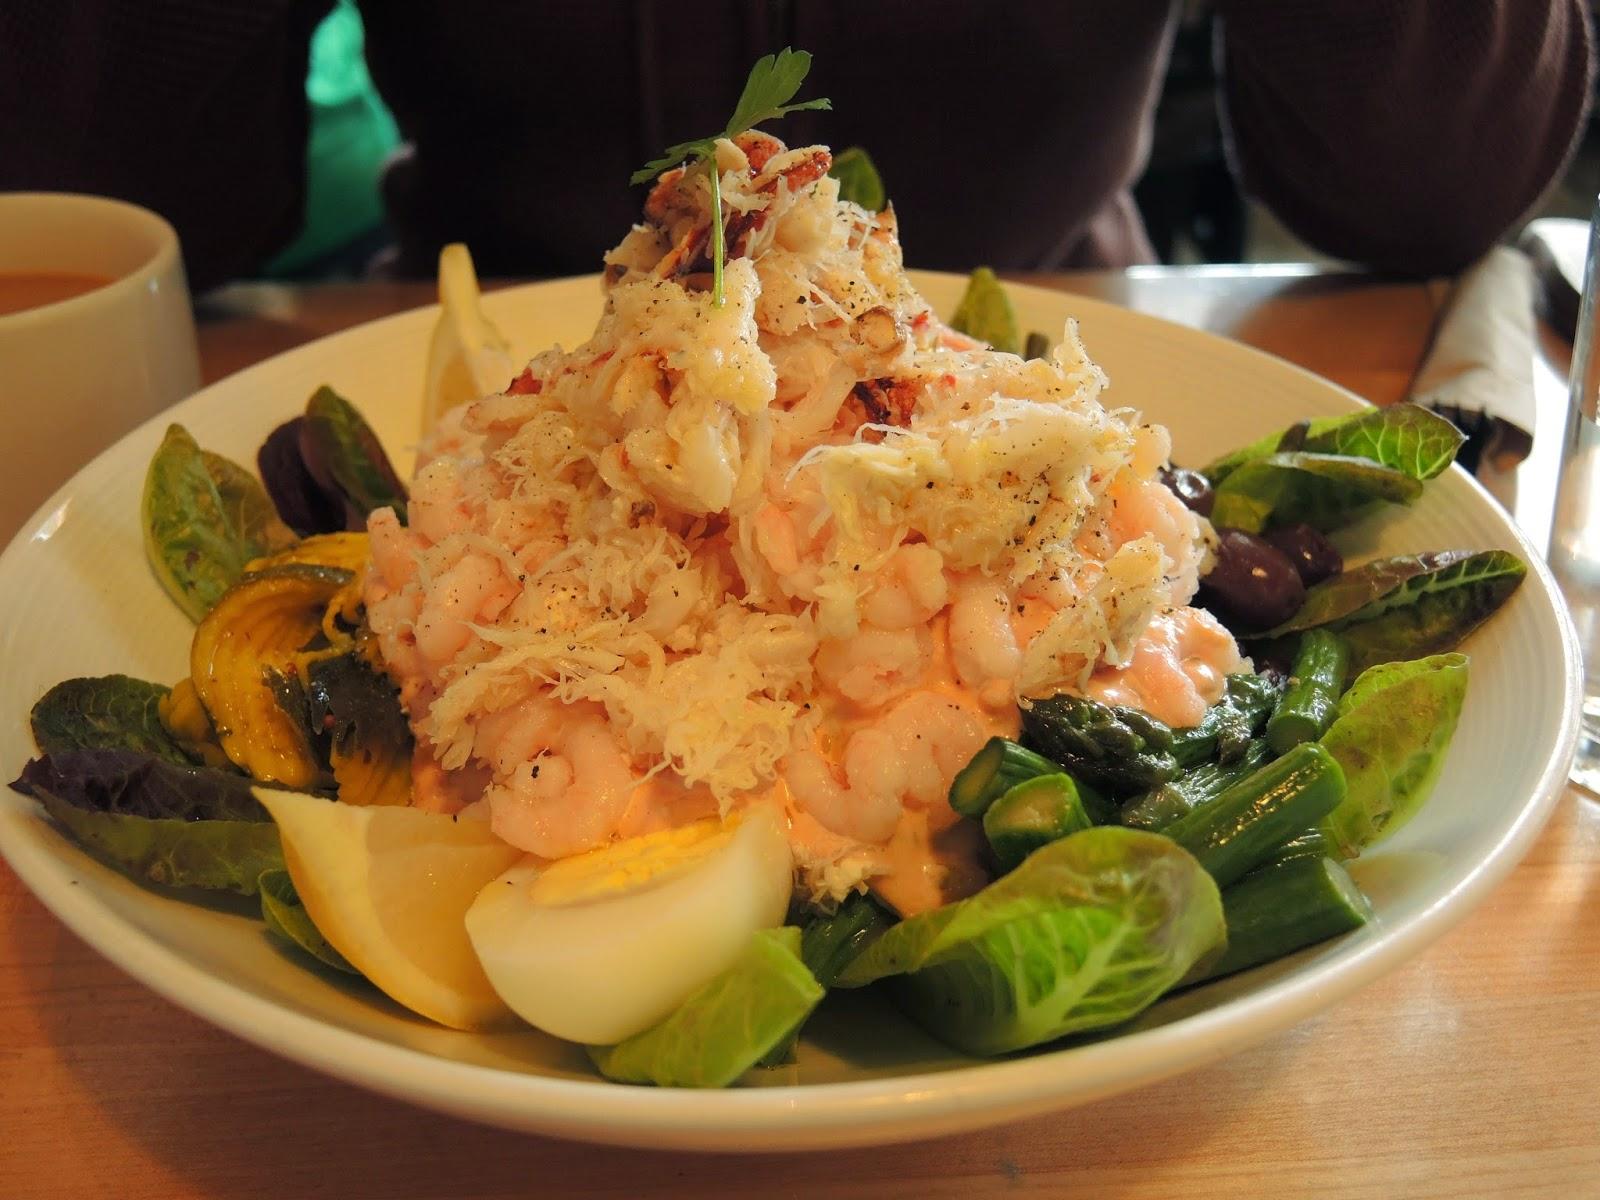 2014 Spring break 美國西岸自駕遊食記 Part 1 — 沙加緬度、波特蘭